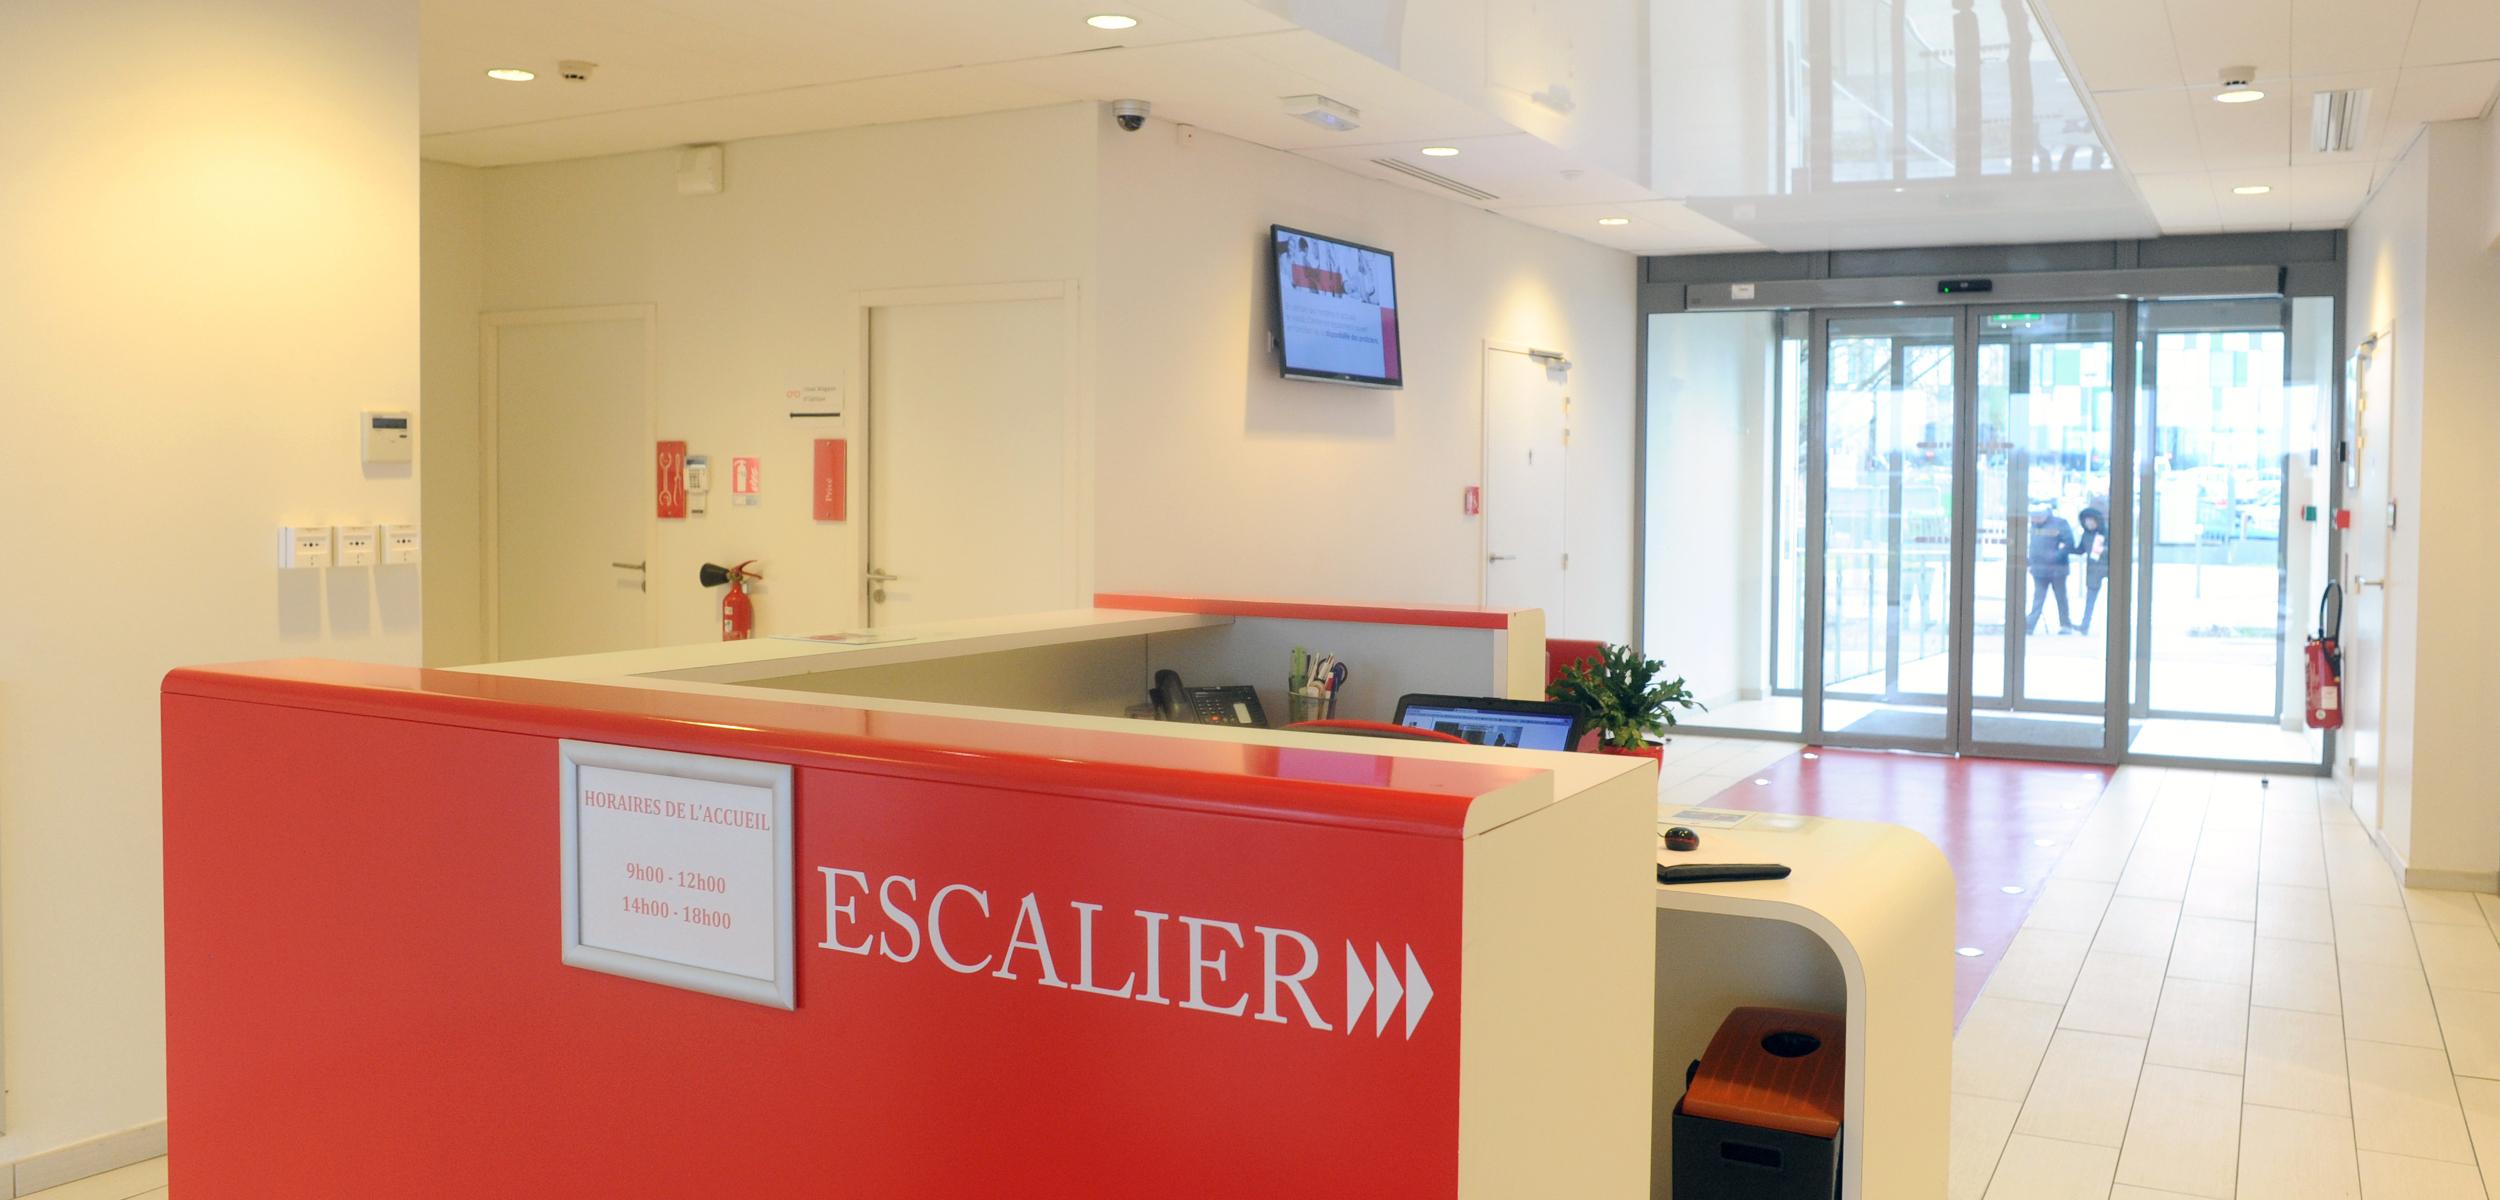 Centre dentaire chalon sur saone 71100 dentiste chalon sur saone - Cabinet de radiologie chalon sur saone ...